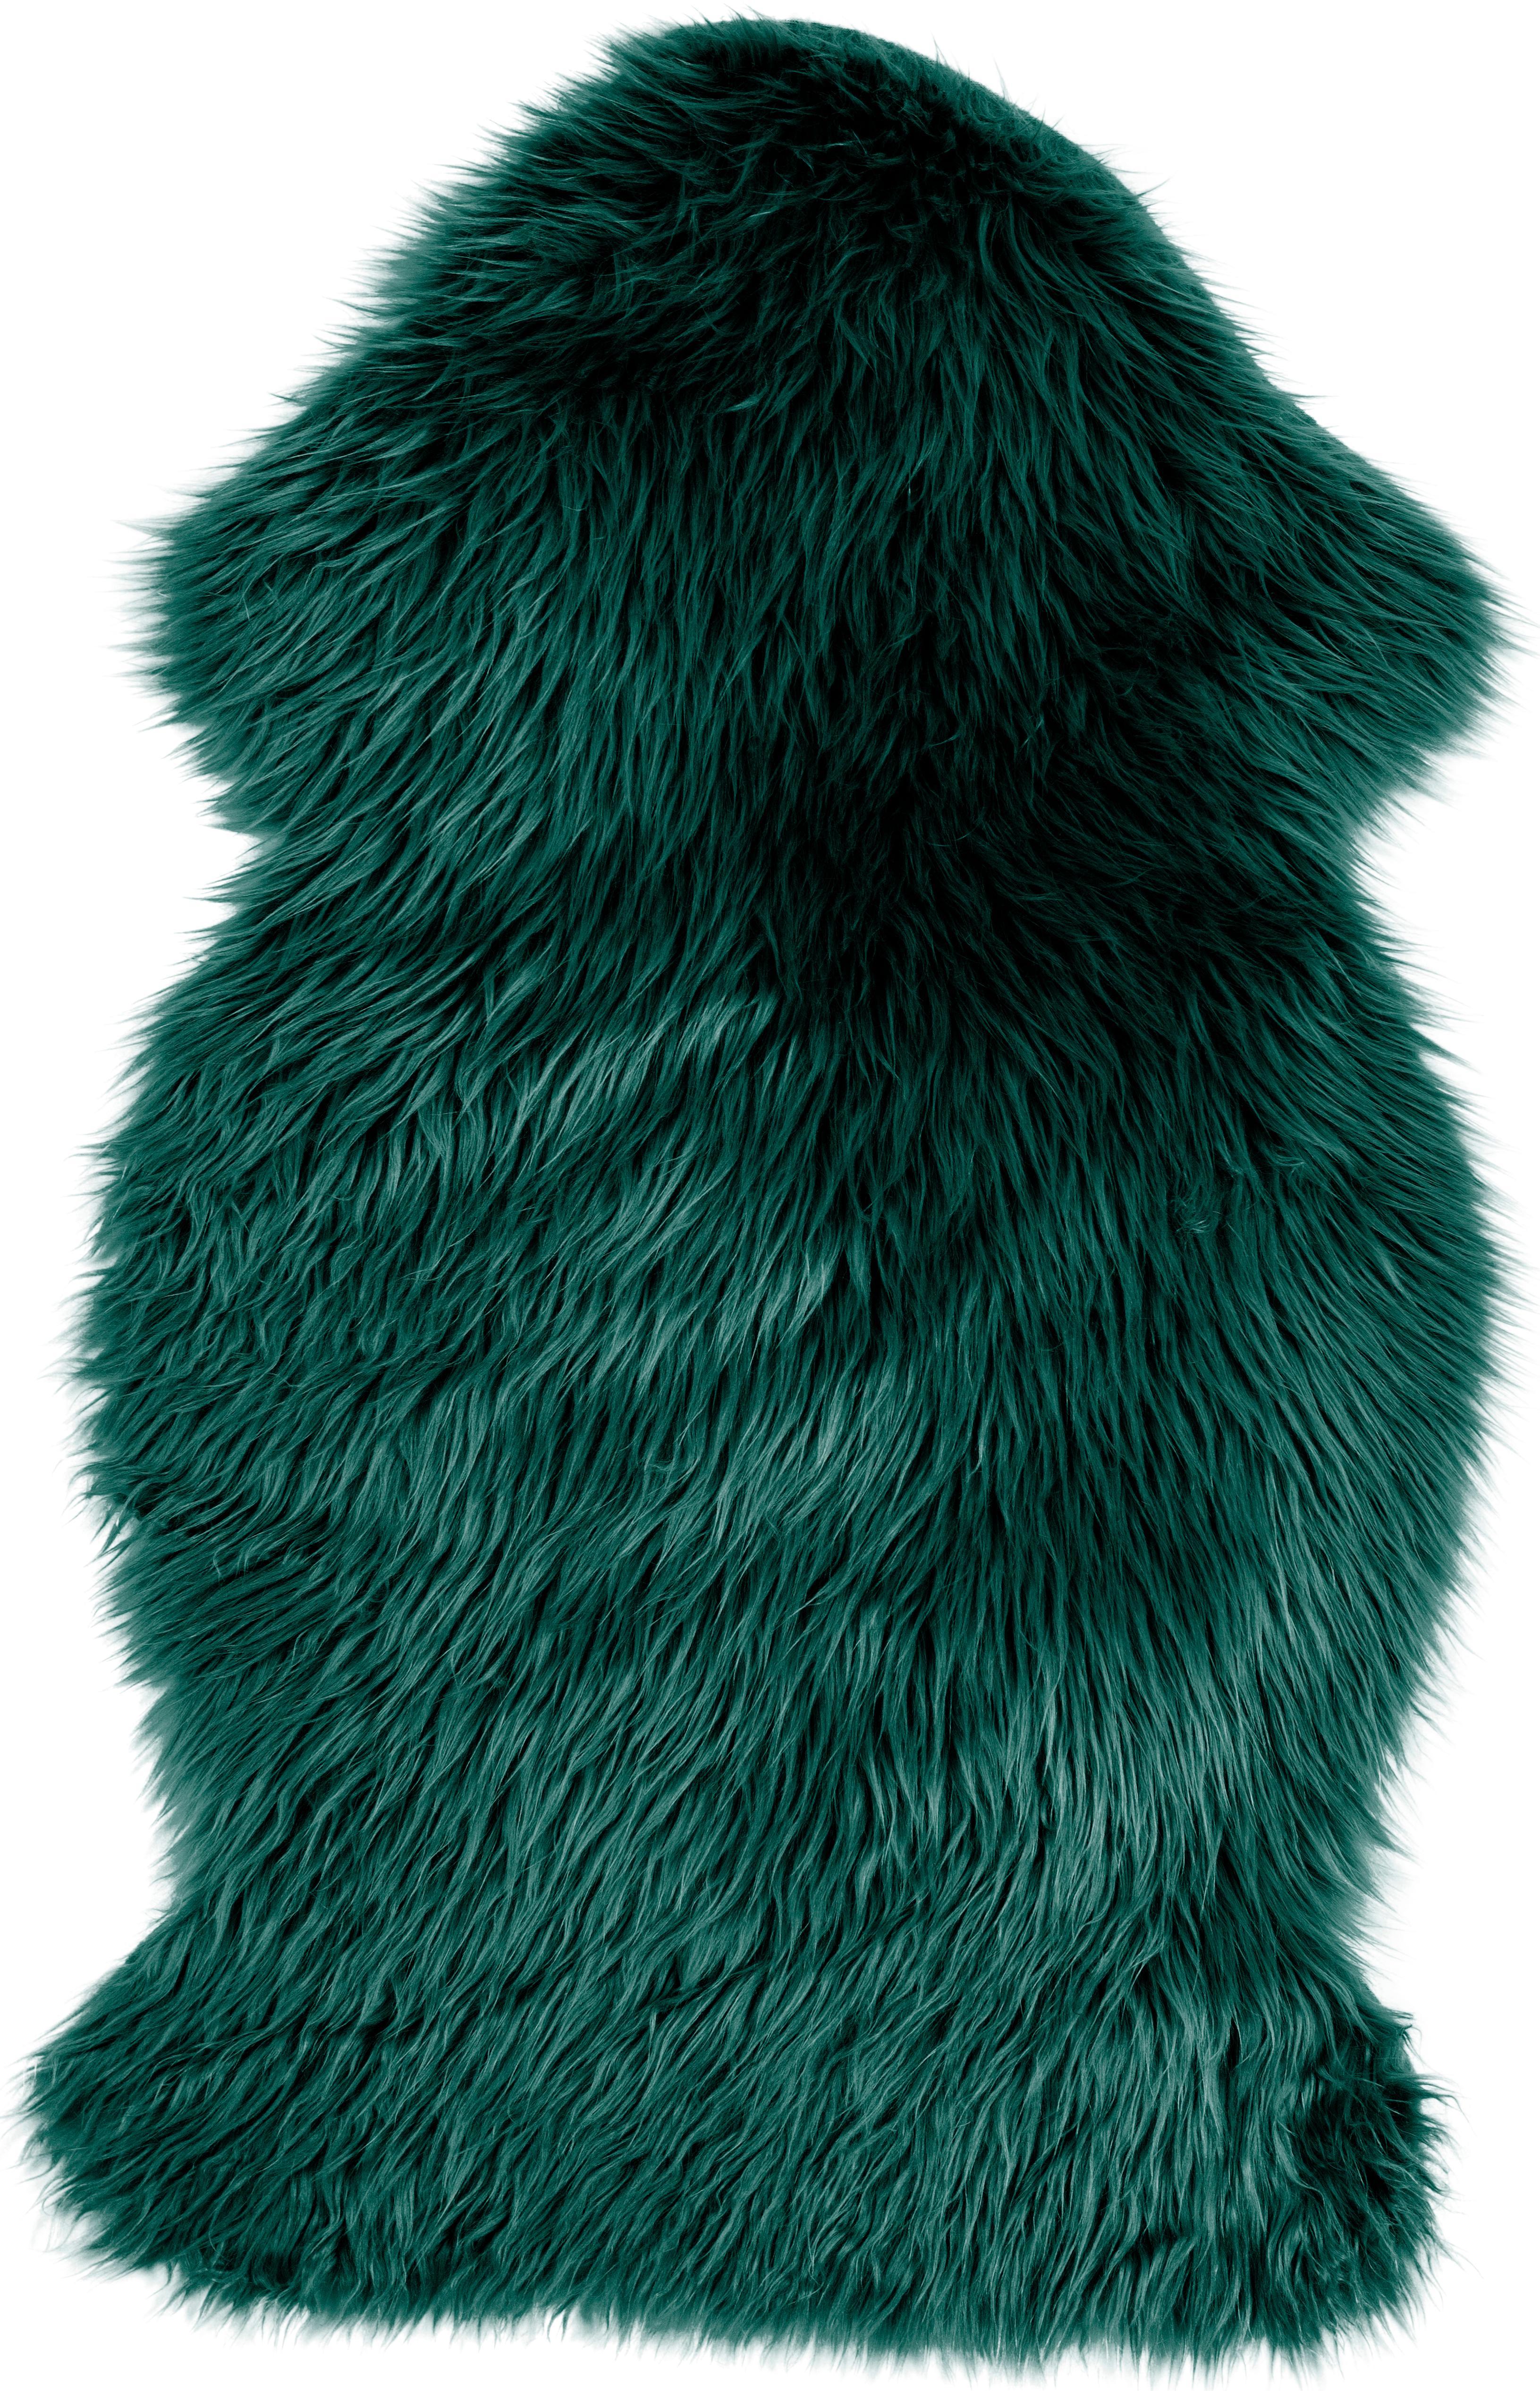 Ecopelliccia Vancouver, Retro: Poliestere liscio, Verde scuro, Larg. 60 x Lung. 100 cm